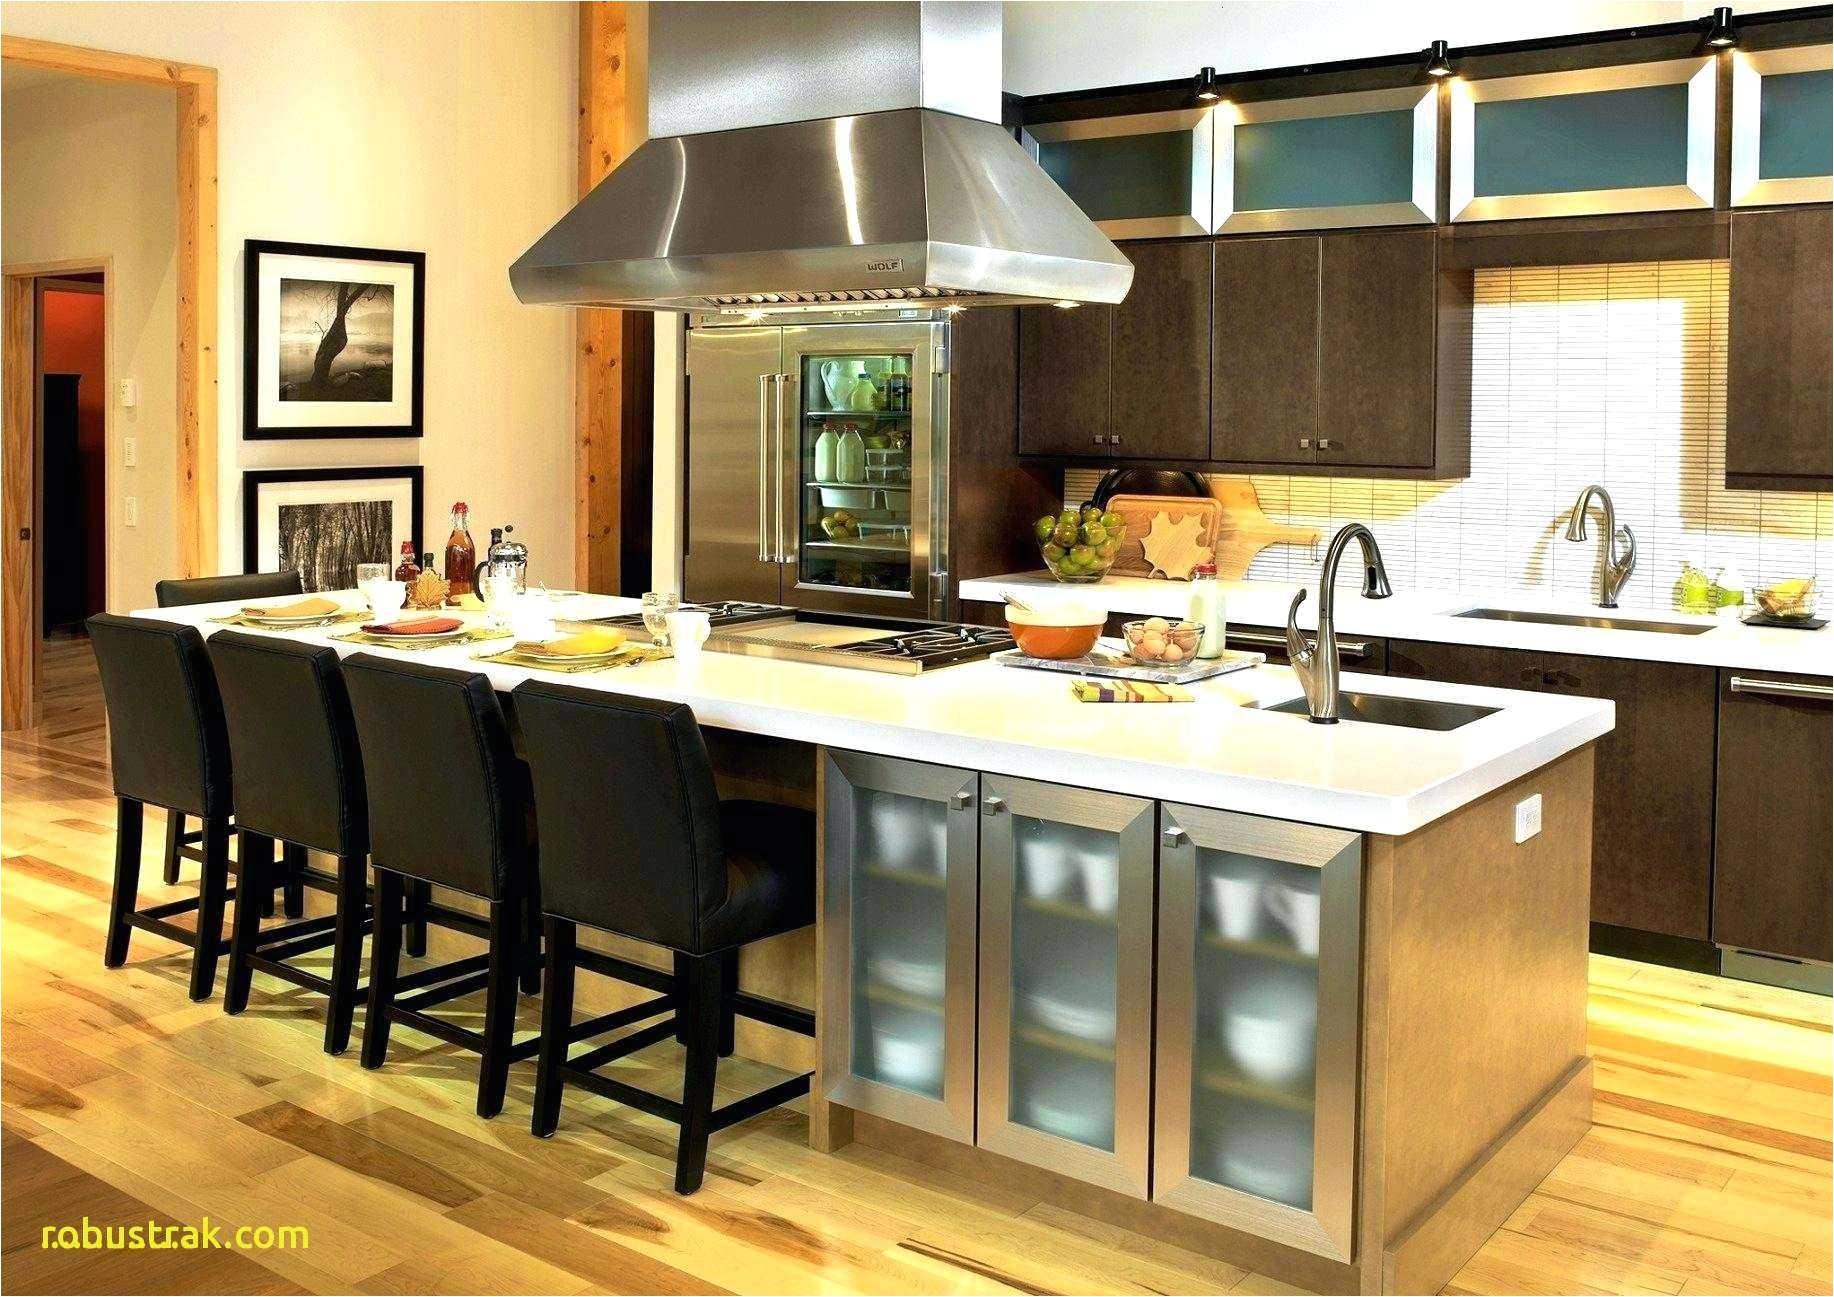 Kitchen island Countertop Unique Kitchen island Designs New Slbss8h Sink Dishwasher Bo 1958i 0d the